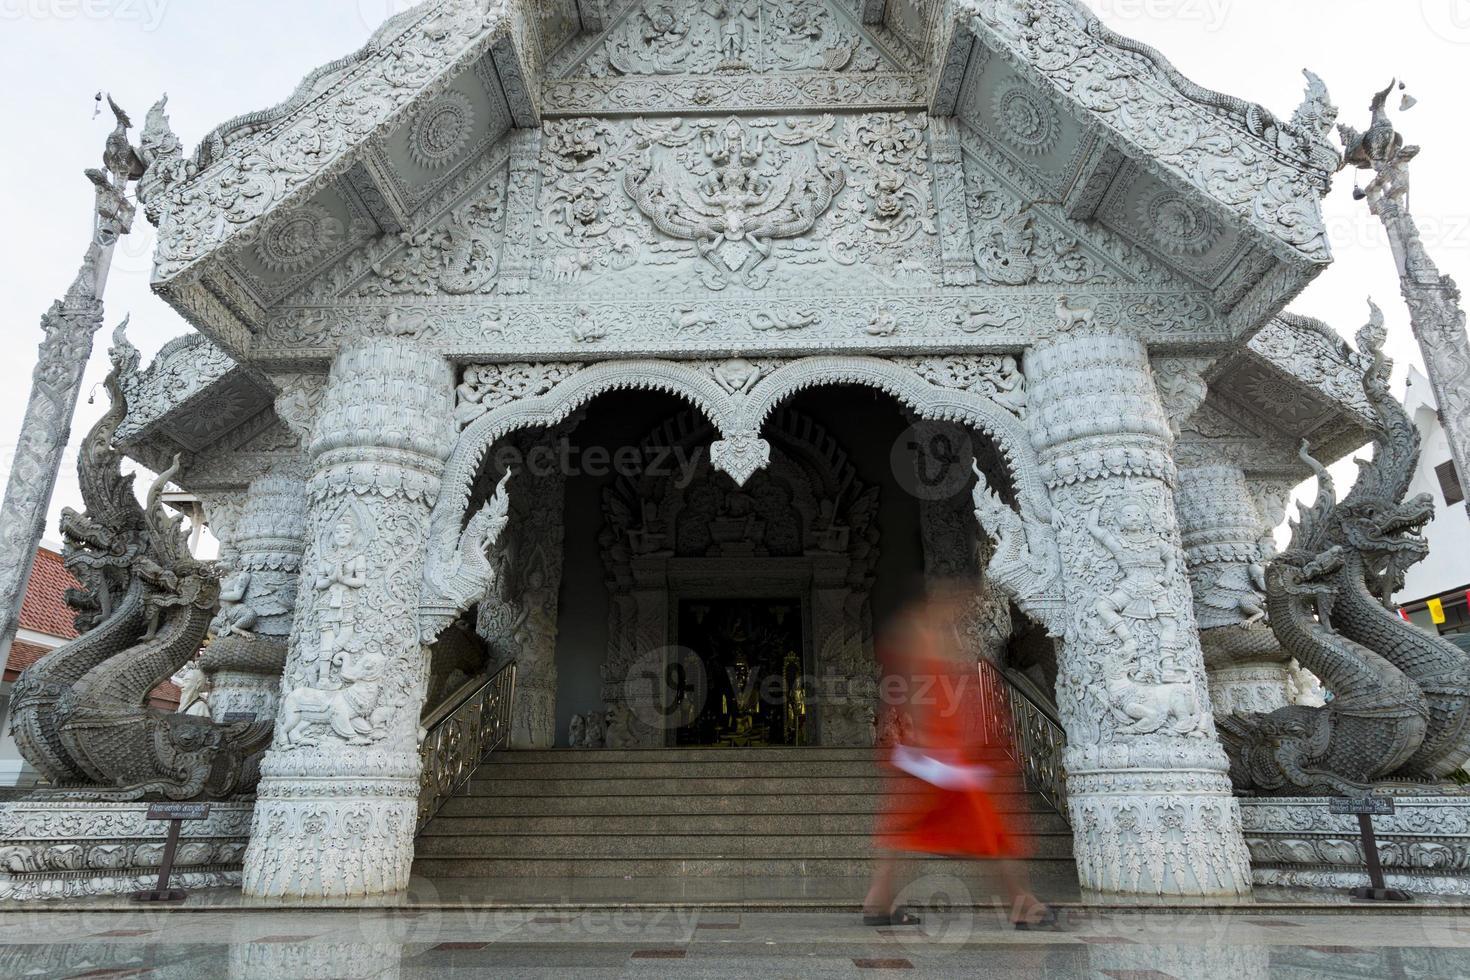 vorm van monnik bij tempel in Thailand foto